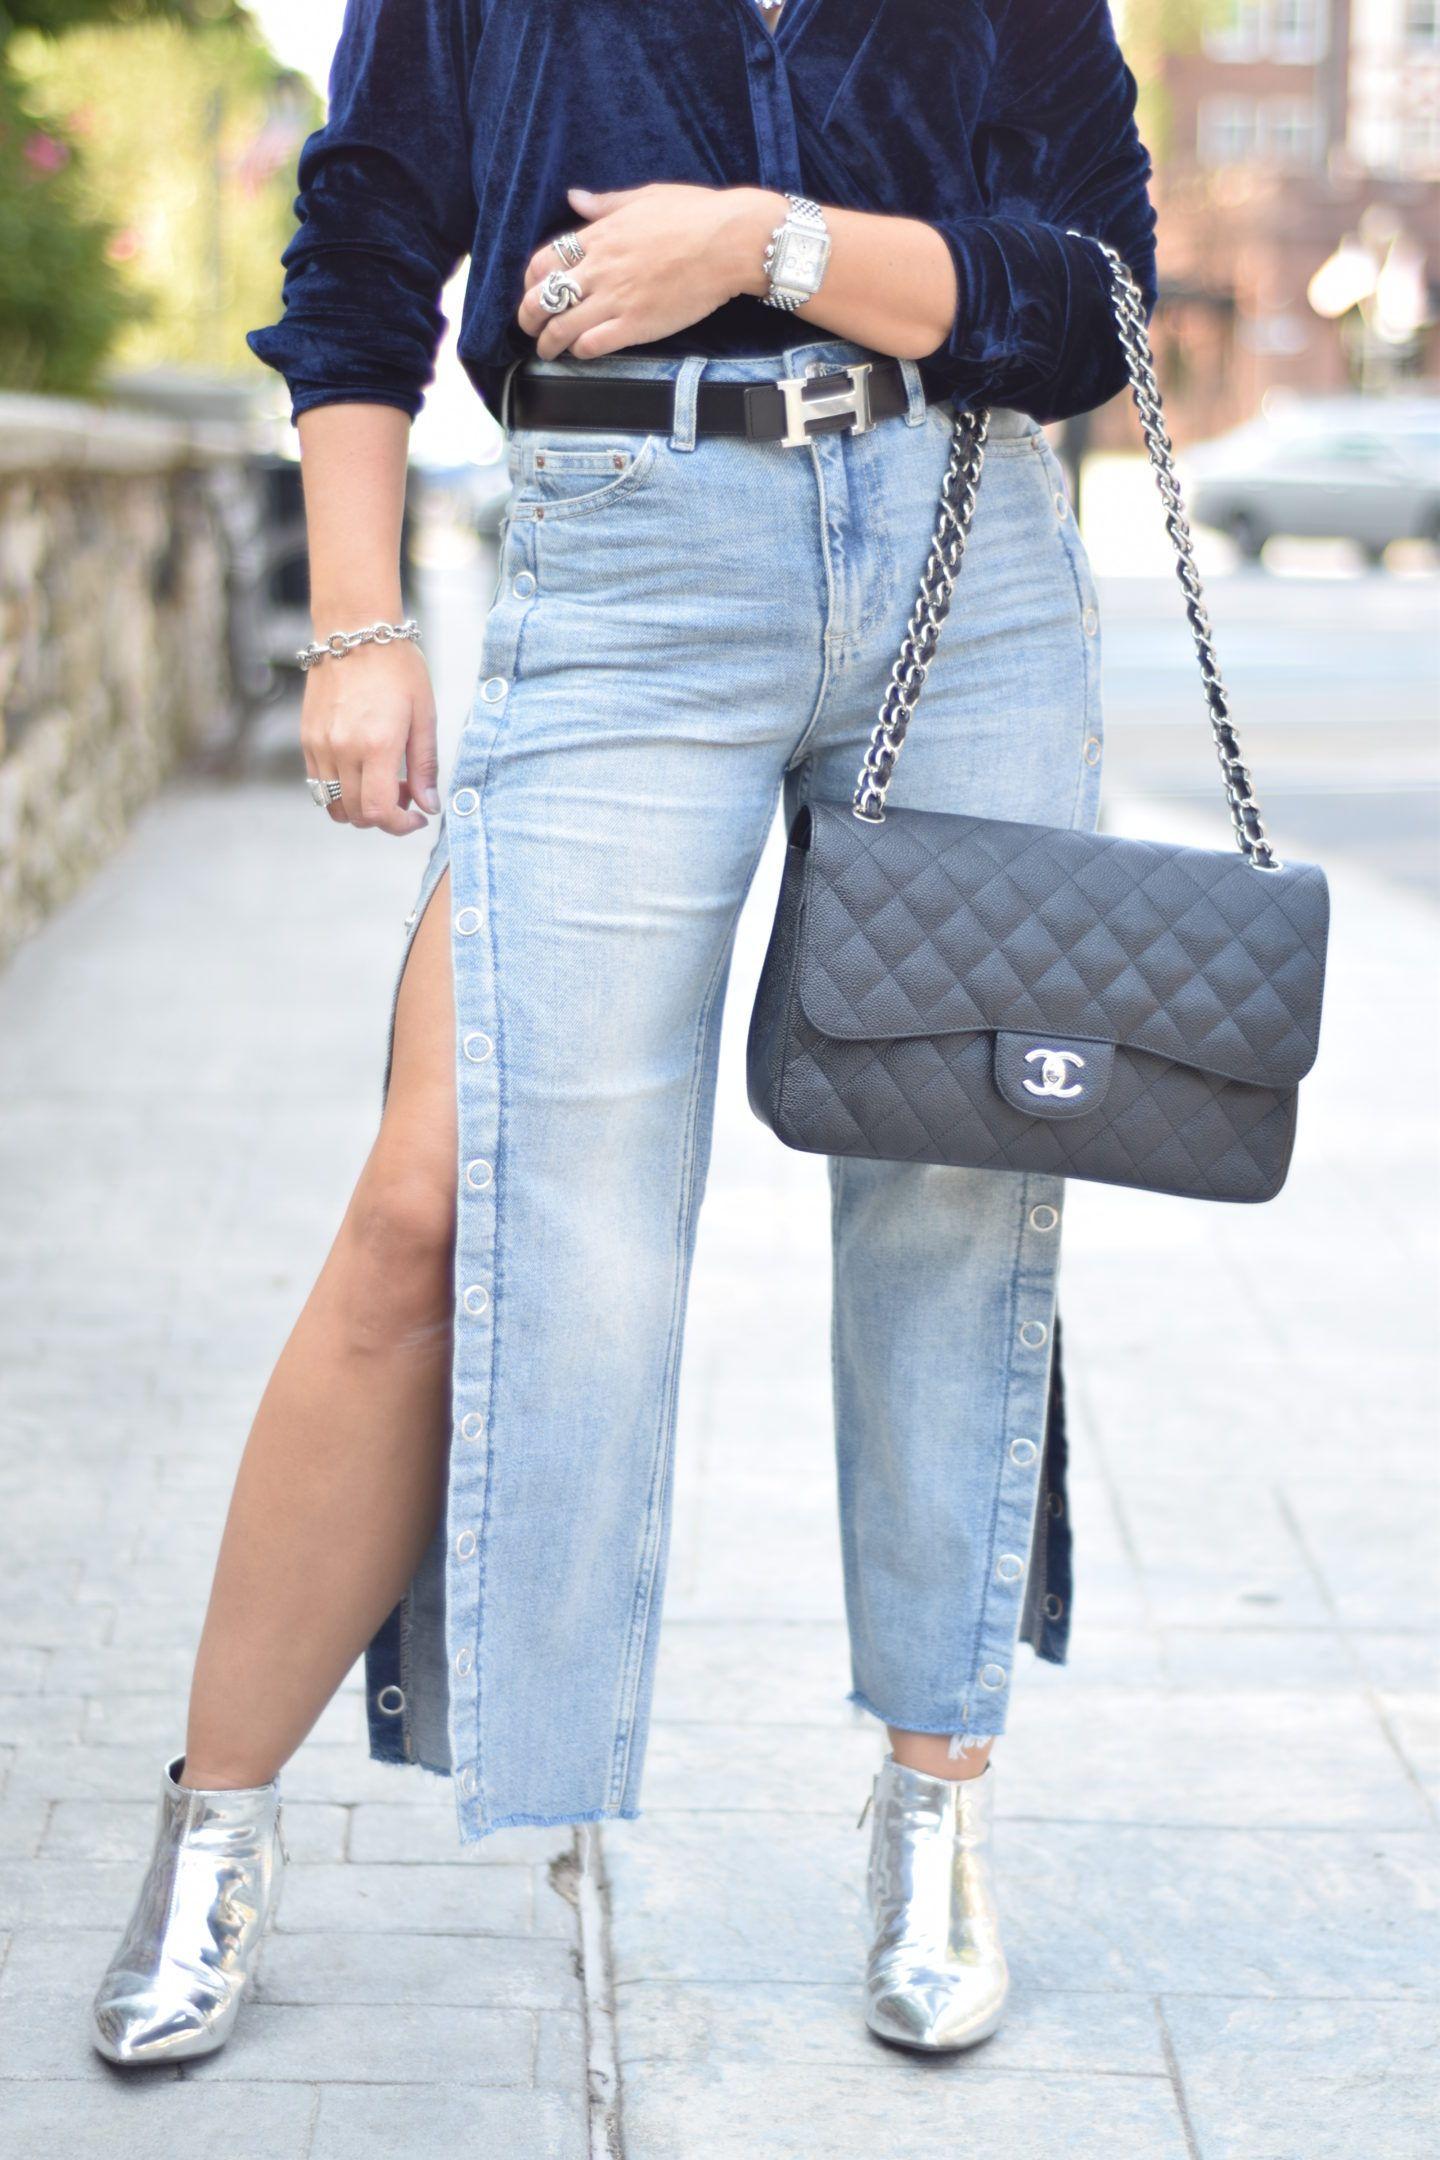 Fashion-Topshop-Street Style-Chanel Bag-Hermes Belt 6a366ca9954cf